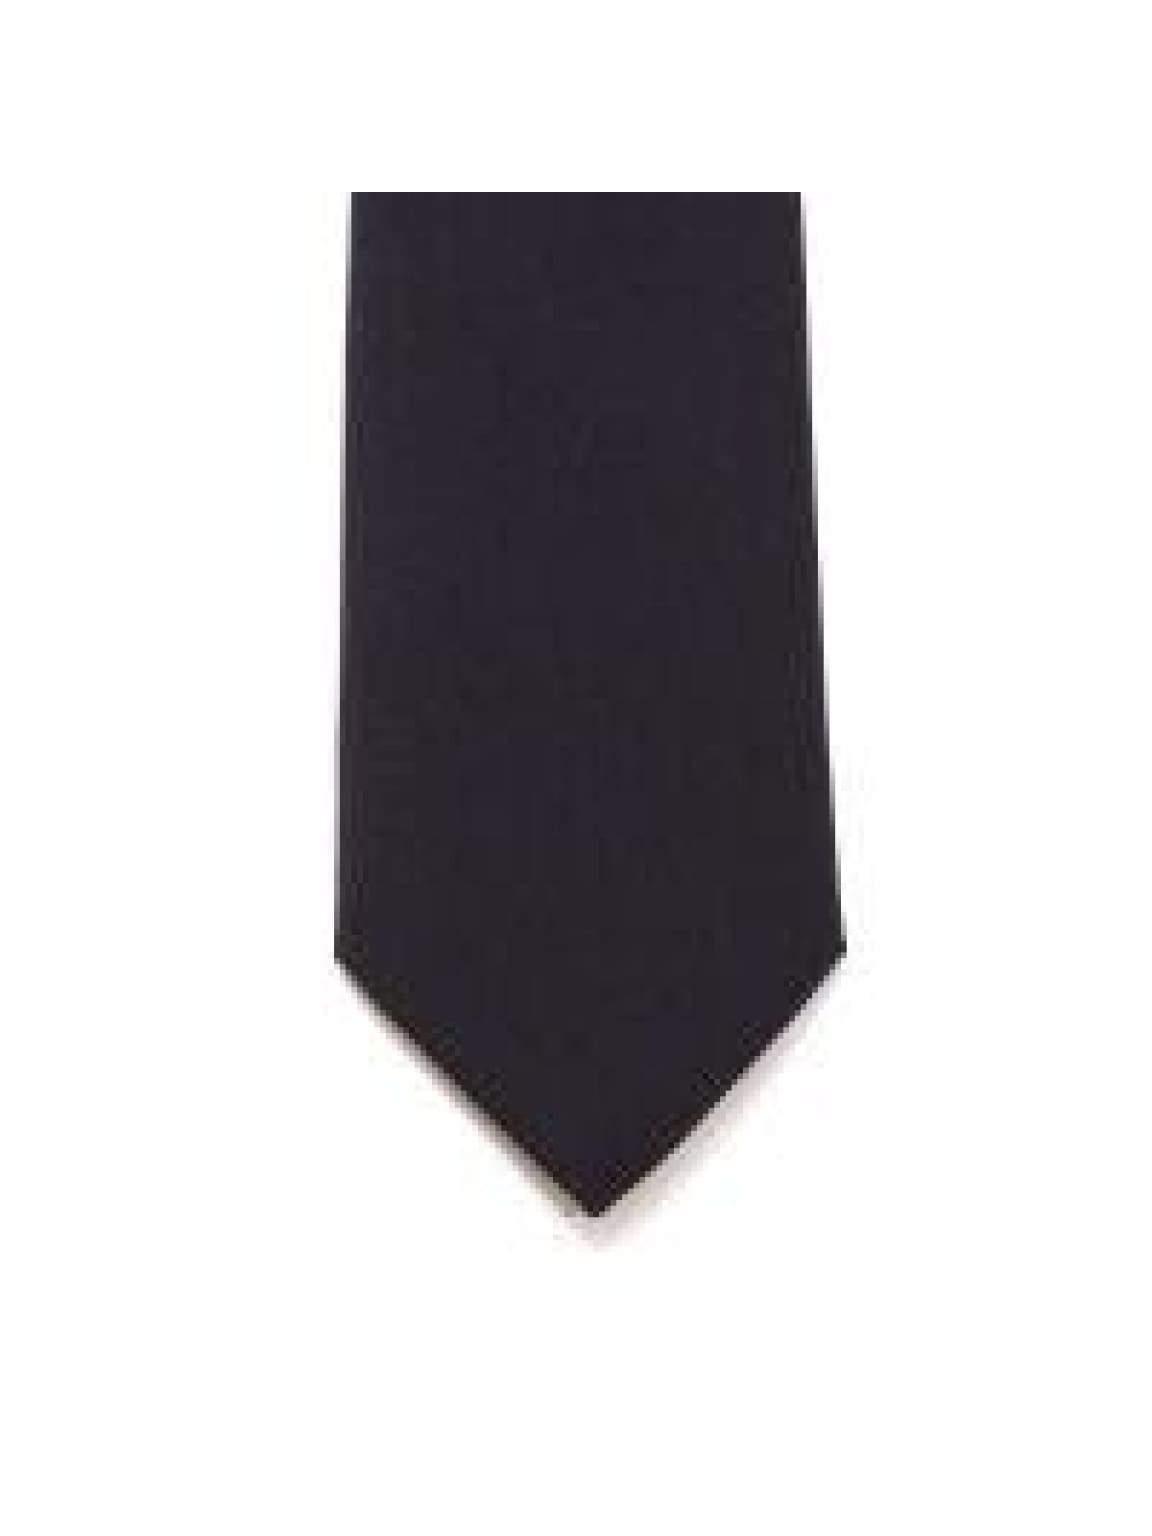 LA Smith Black Skinny Panama Tie - Accessories